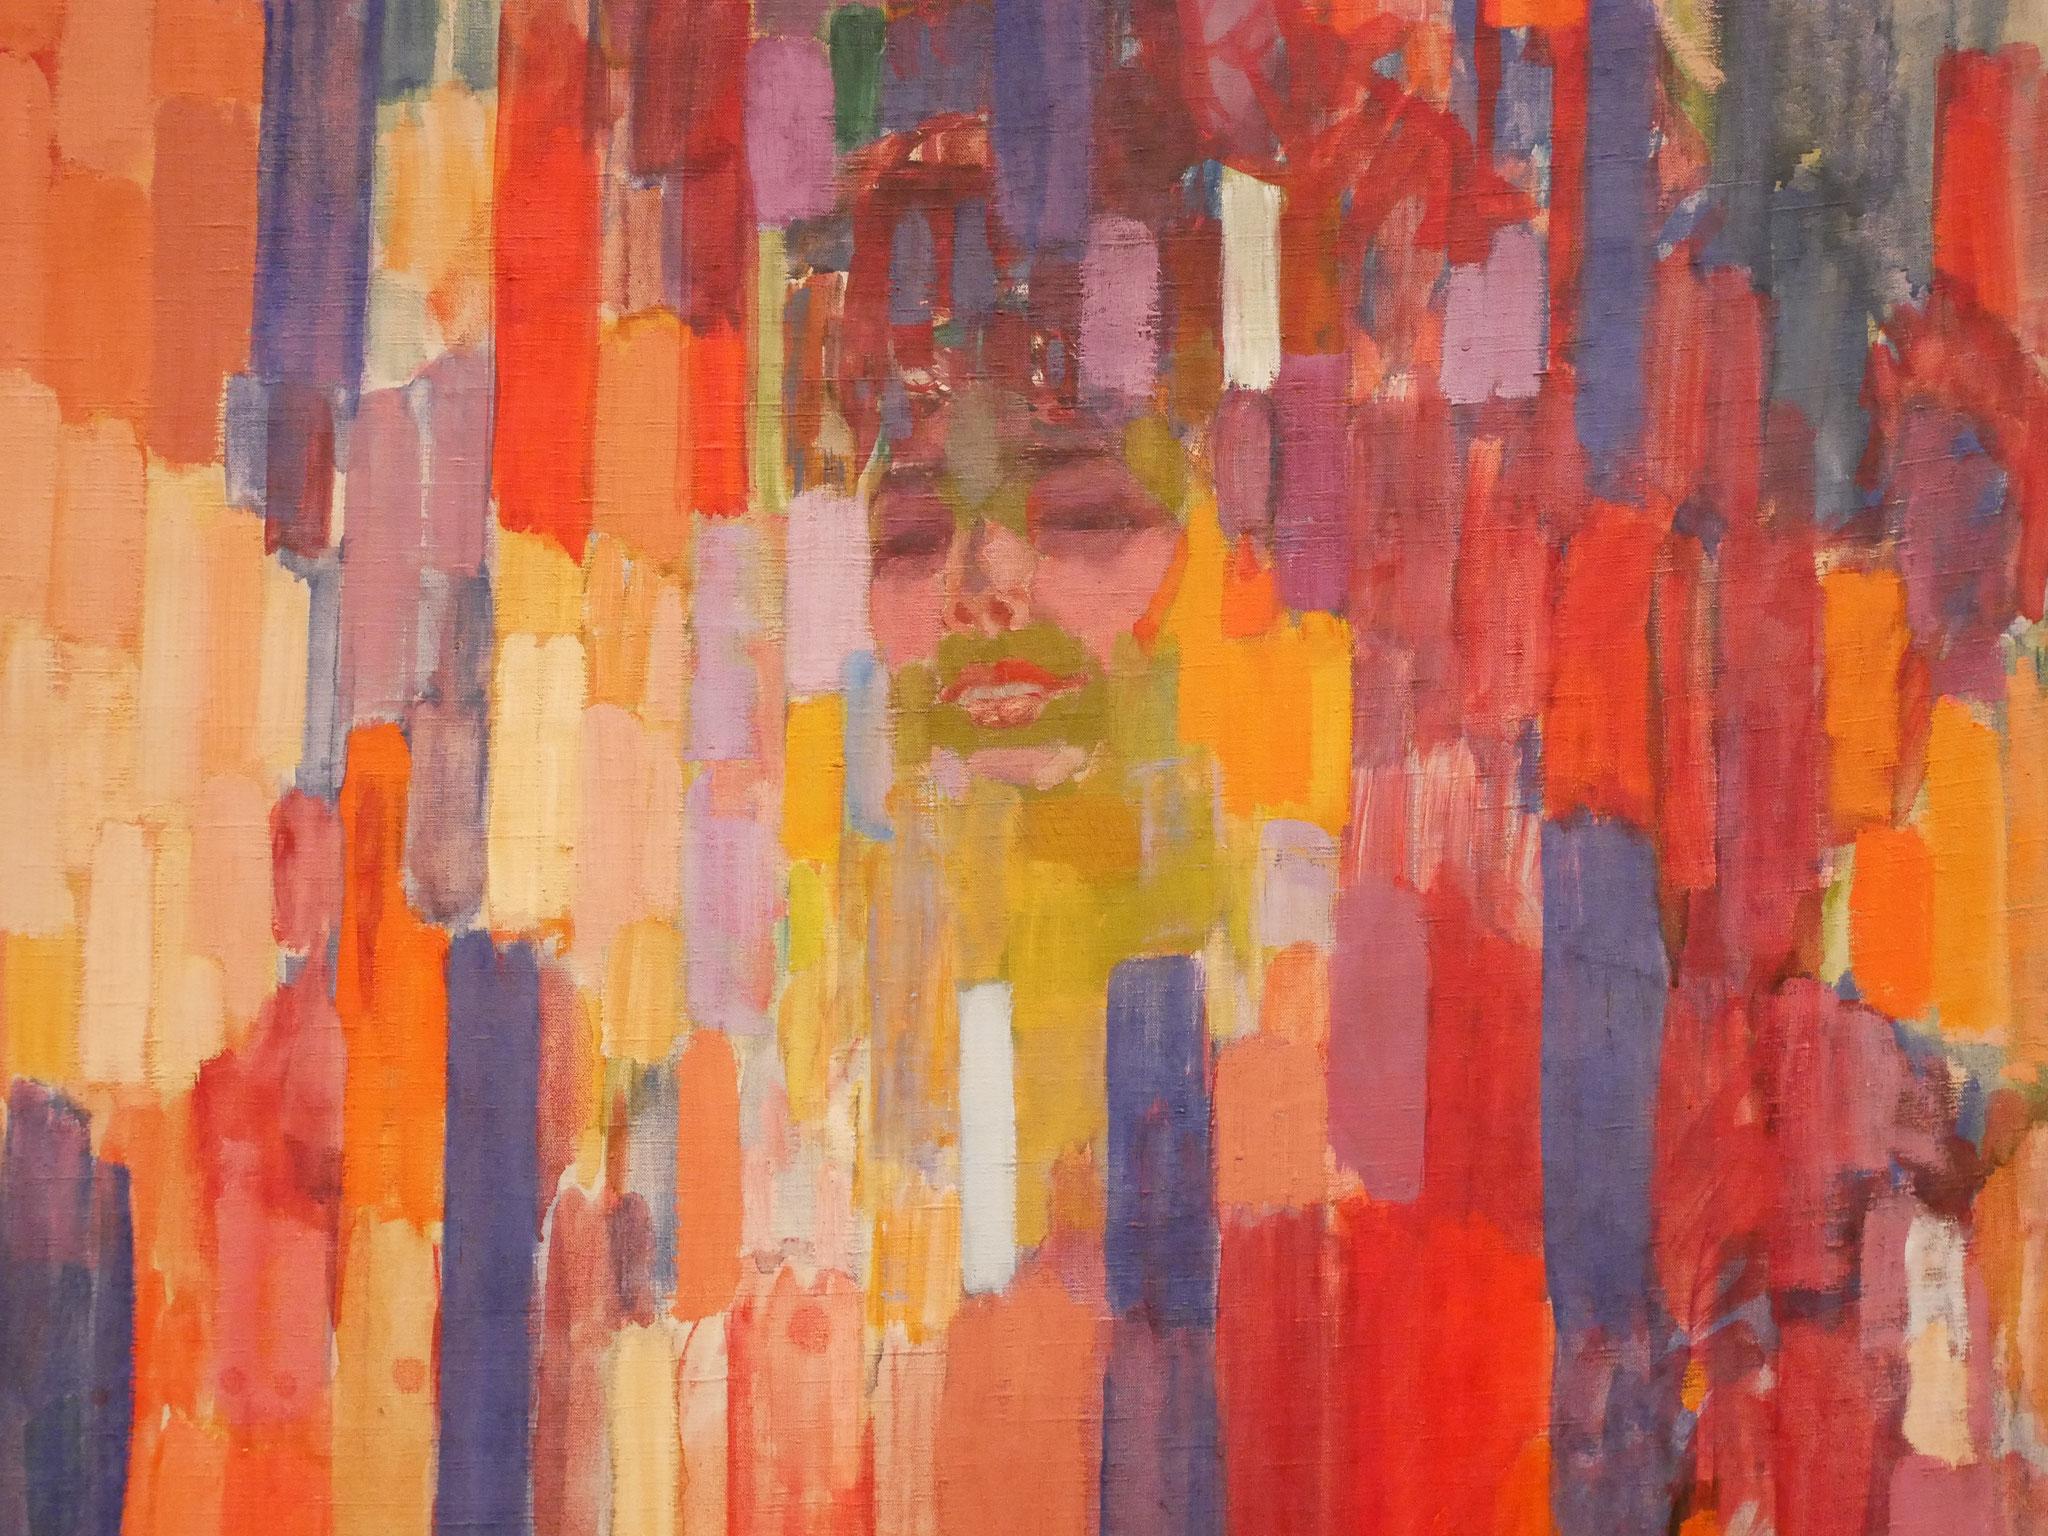 František Kupka, Mme Kupka among Verticals, 1910-11 On view